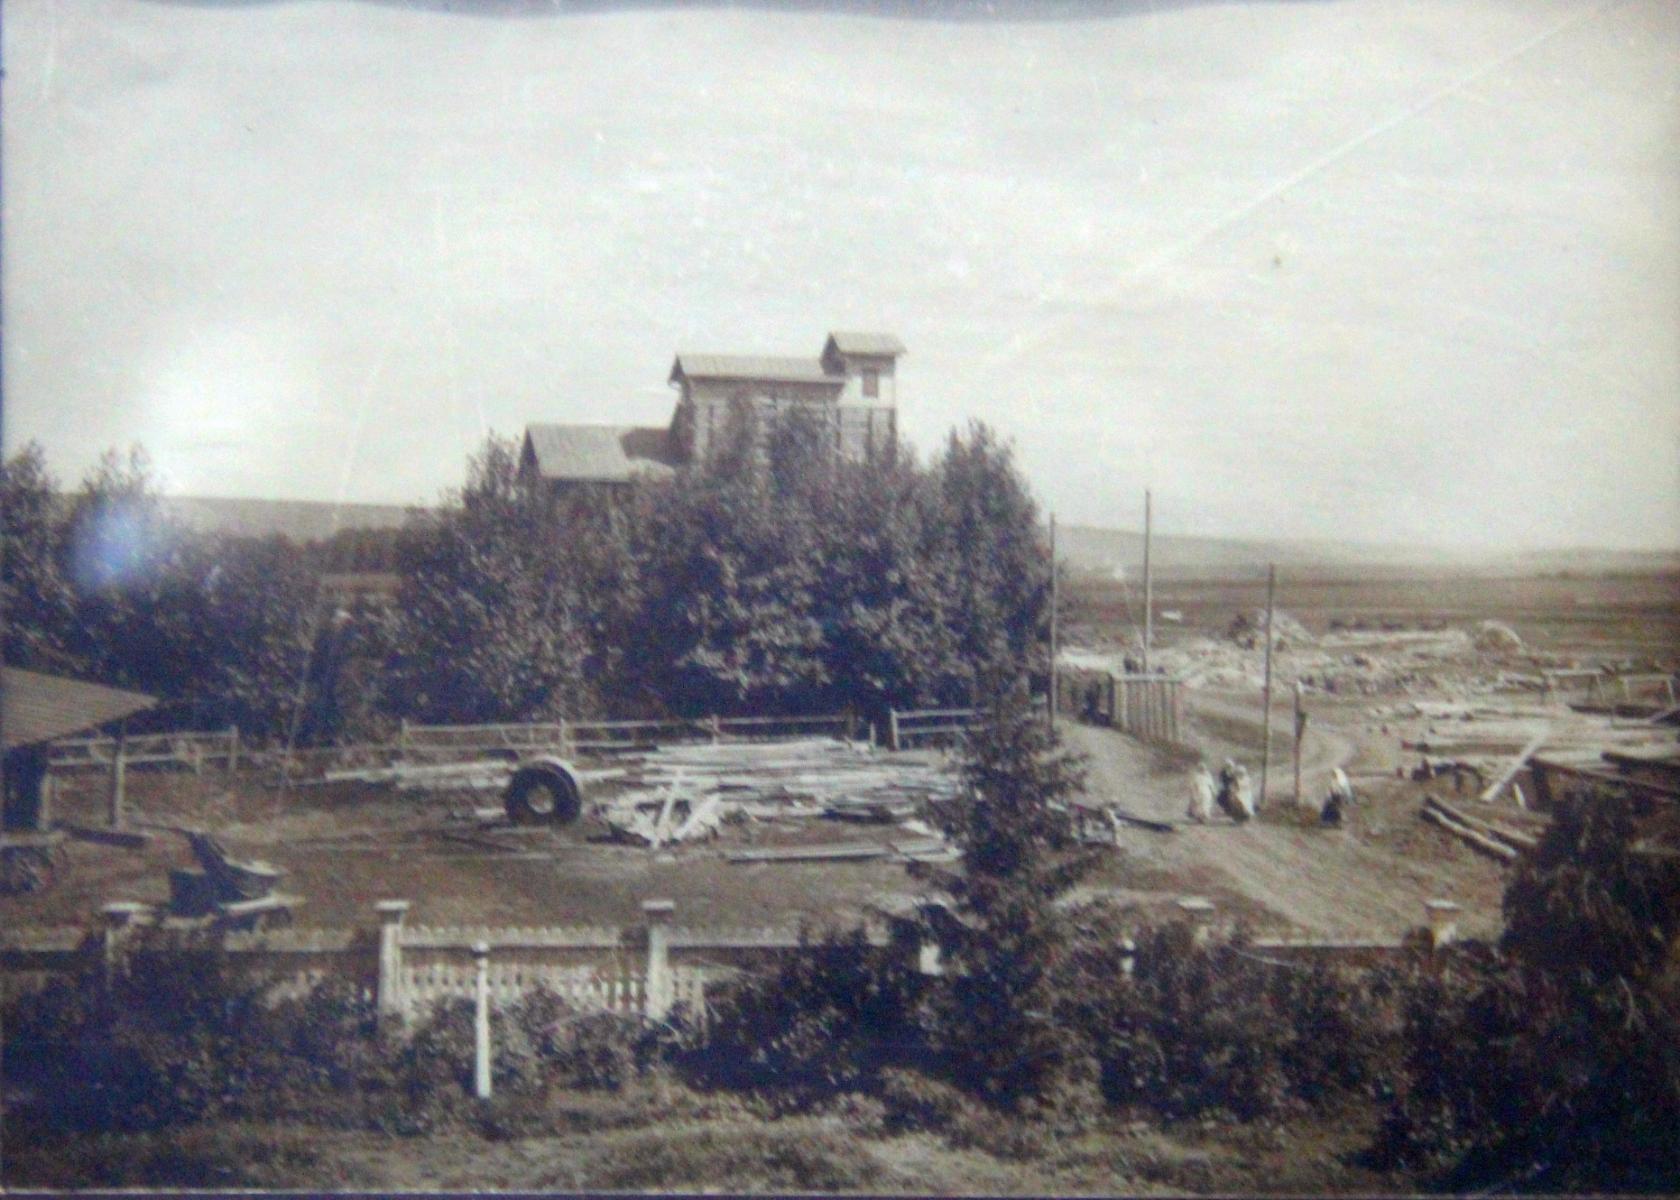 Окрестности Симбирска. Мельница Чебоксарова на реке Свияга